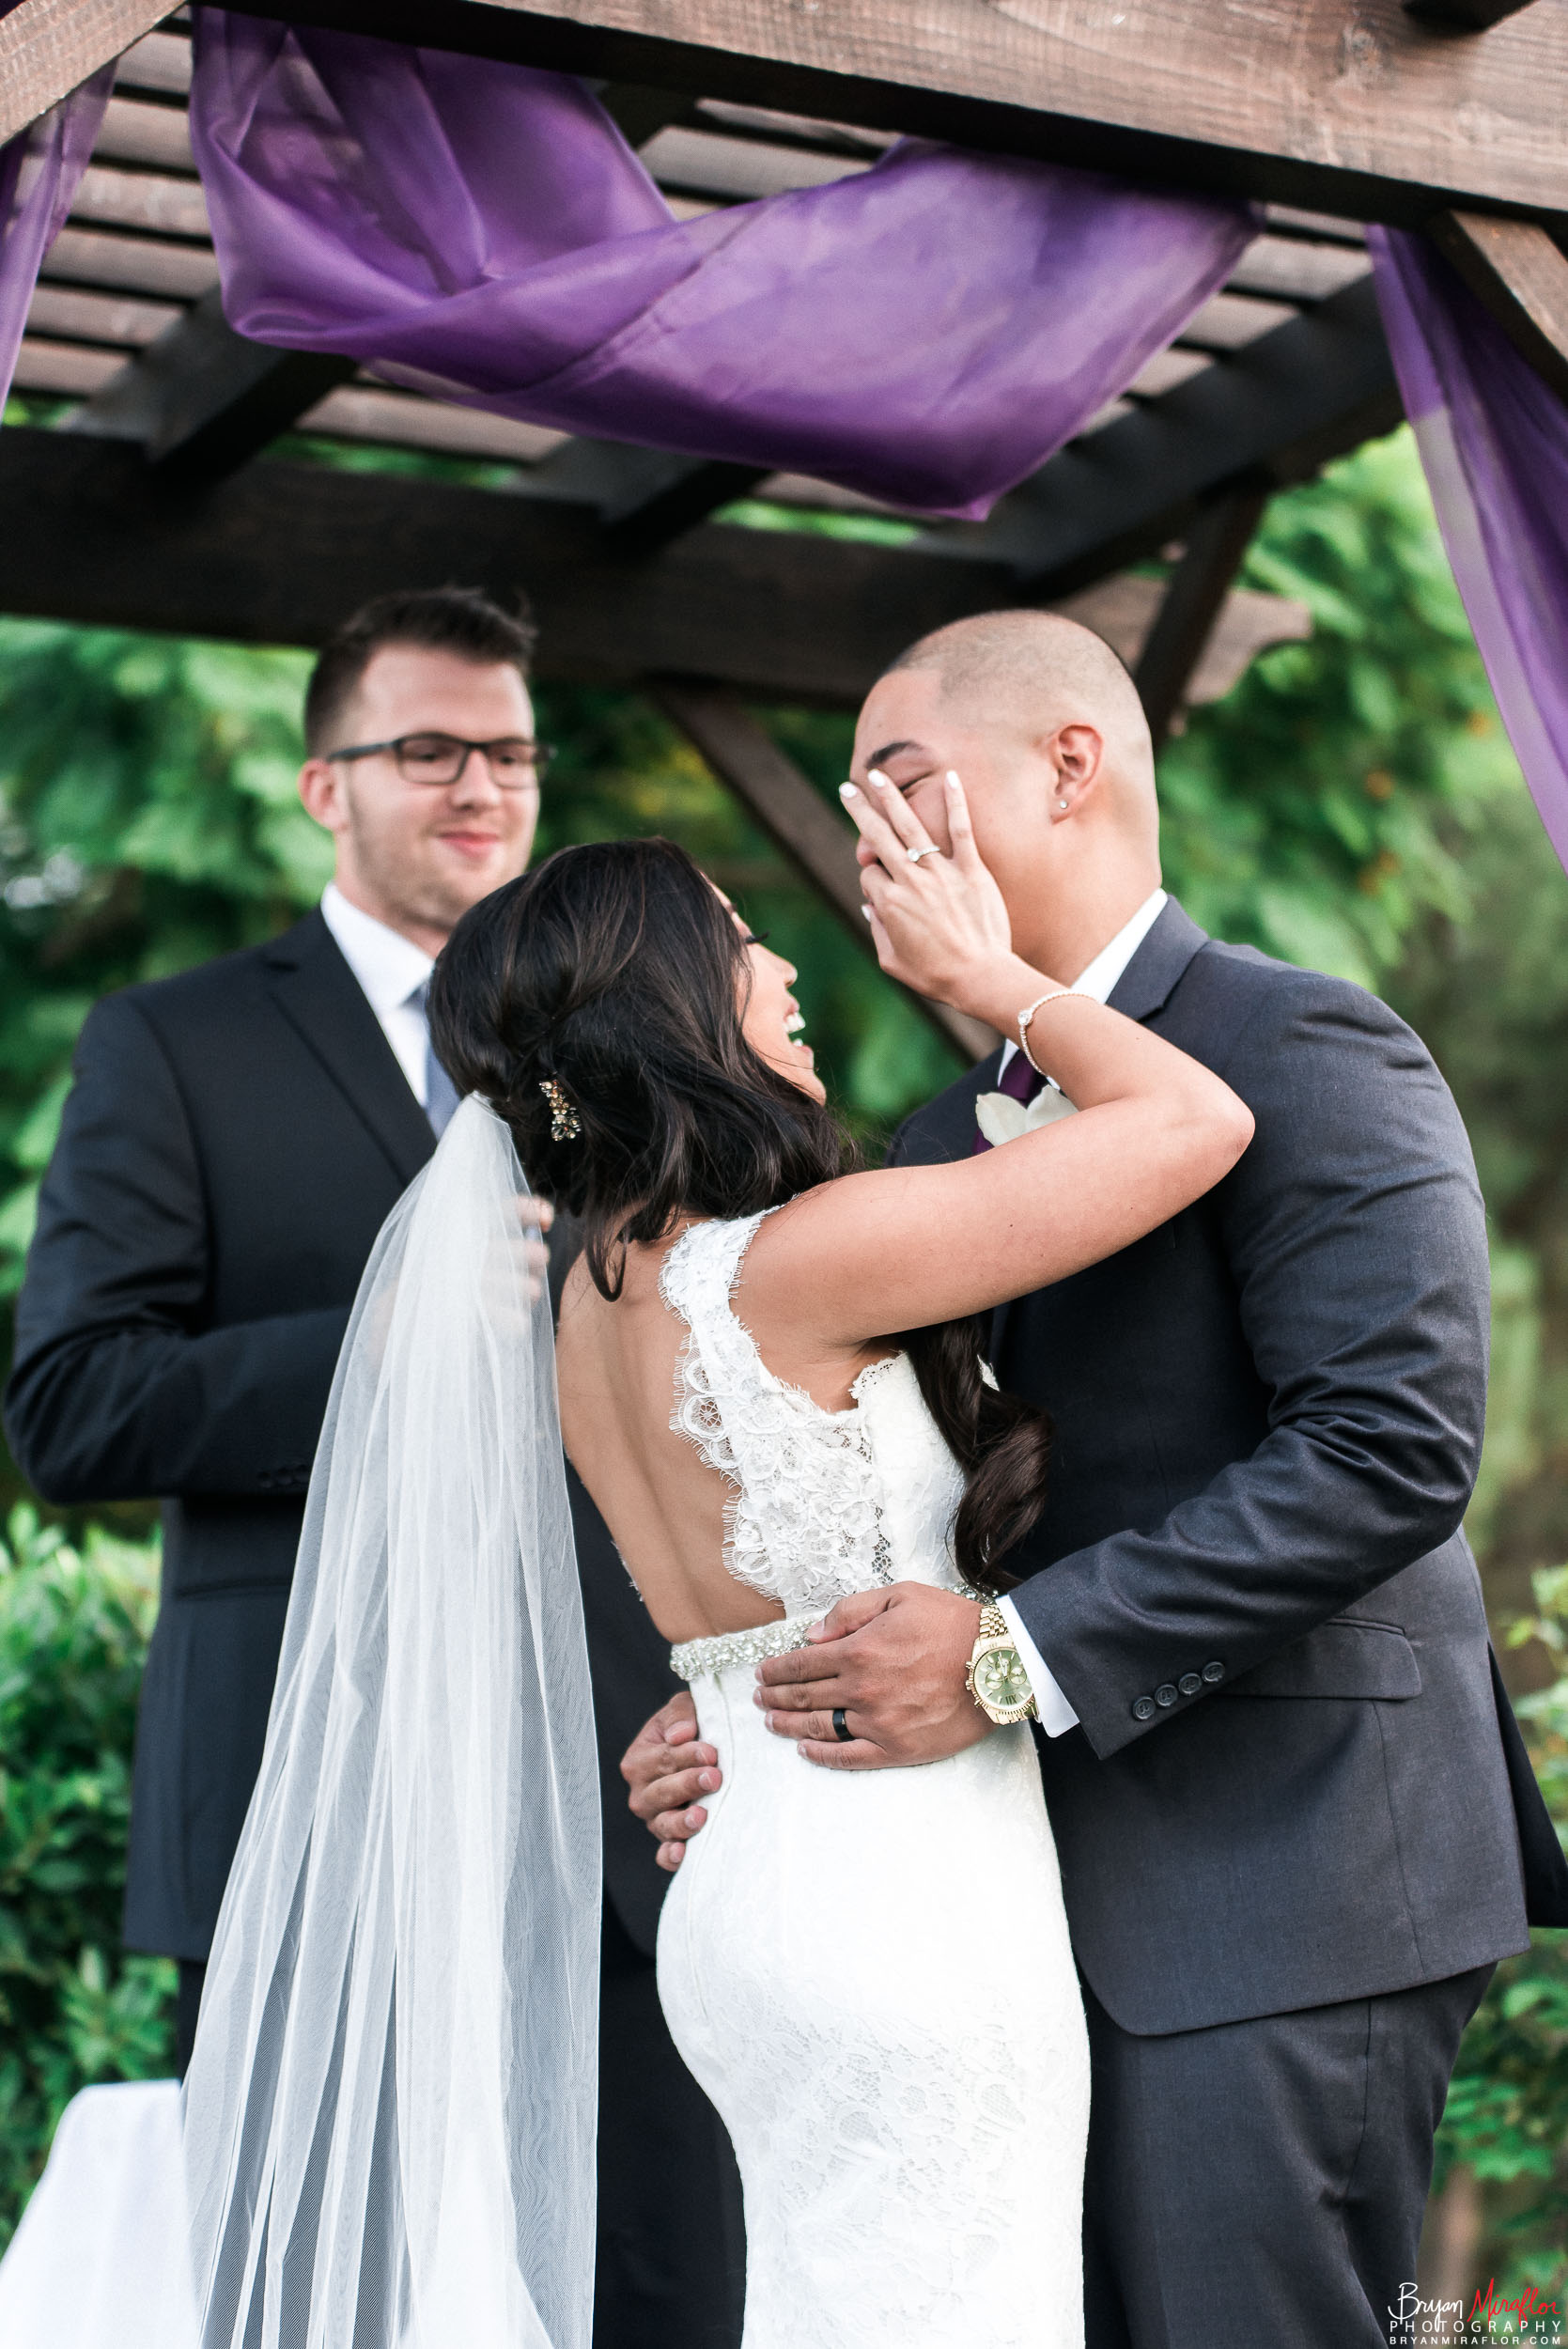 Bryan-Miraflor-Photography-Trisha-Dexter-Married-20170923-054.jpg